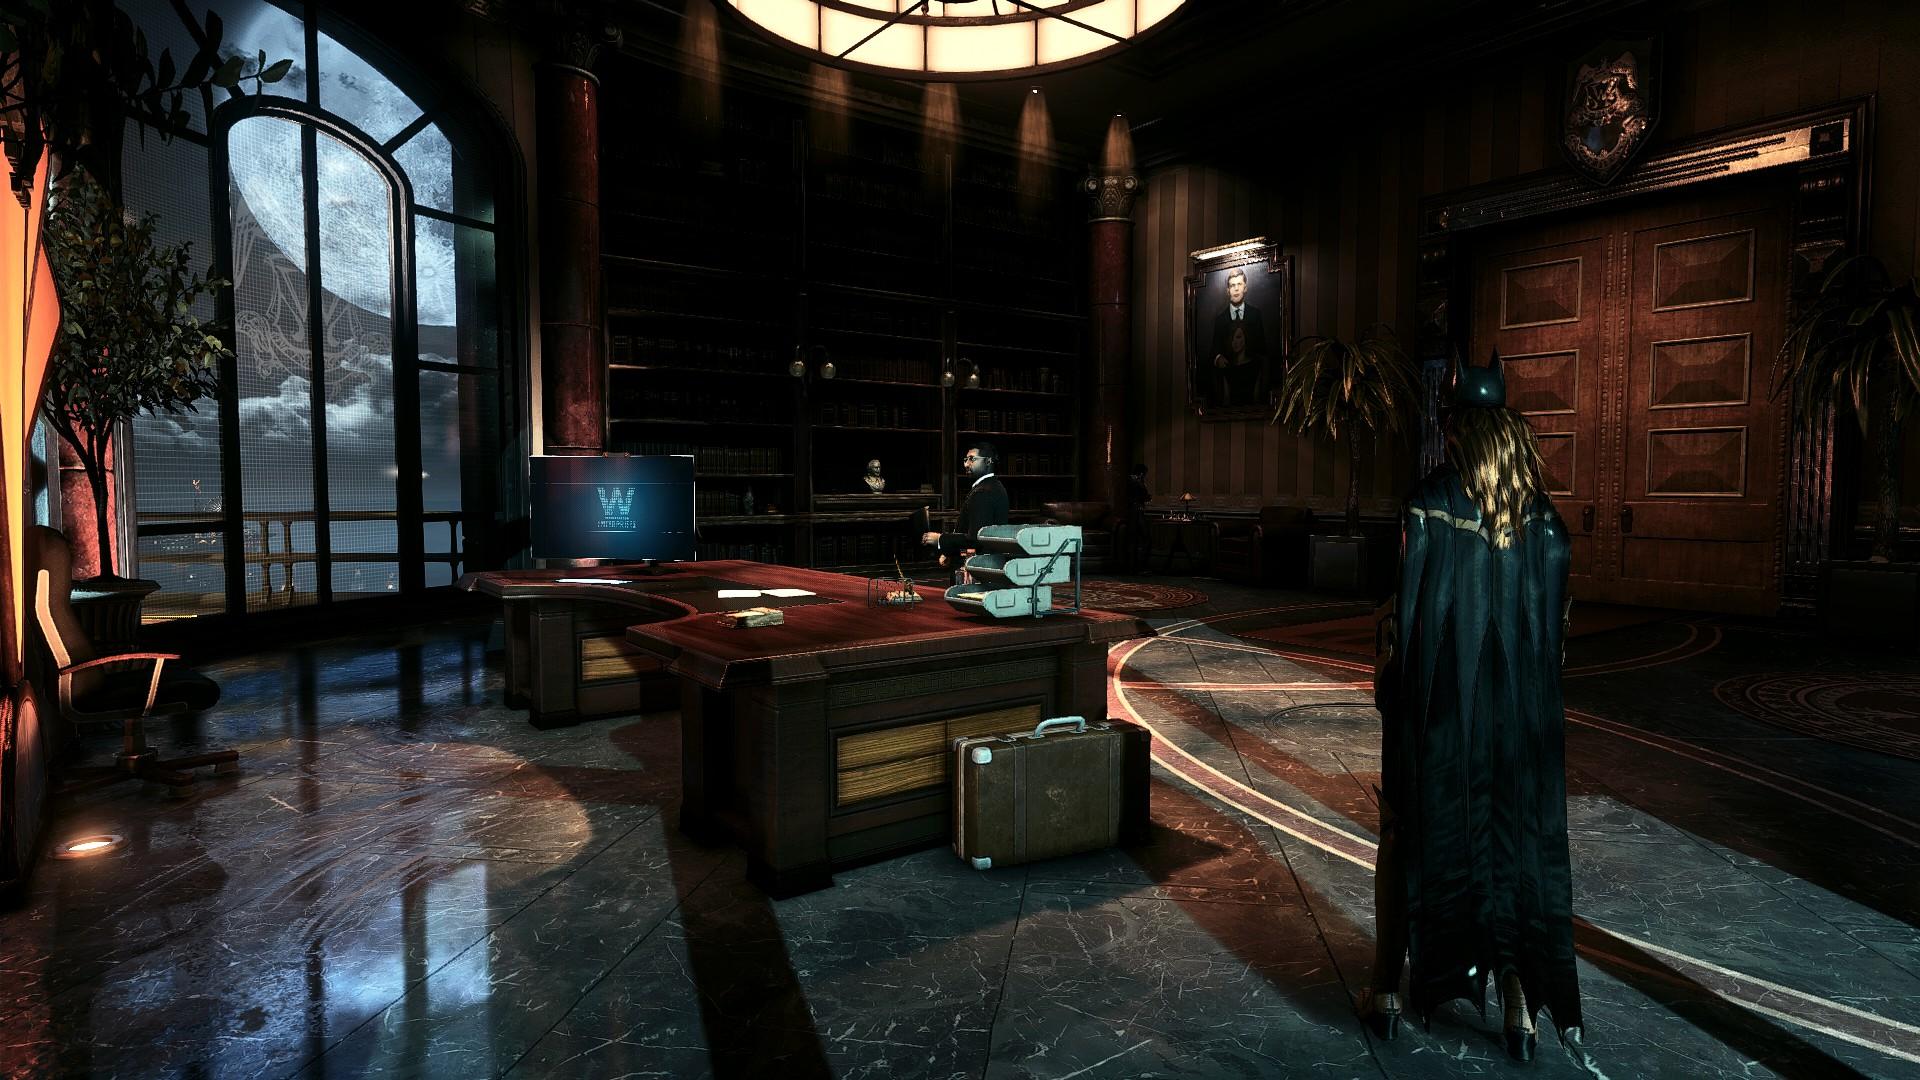 20191013170056_1.jpg - Batman: Arkham Knight